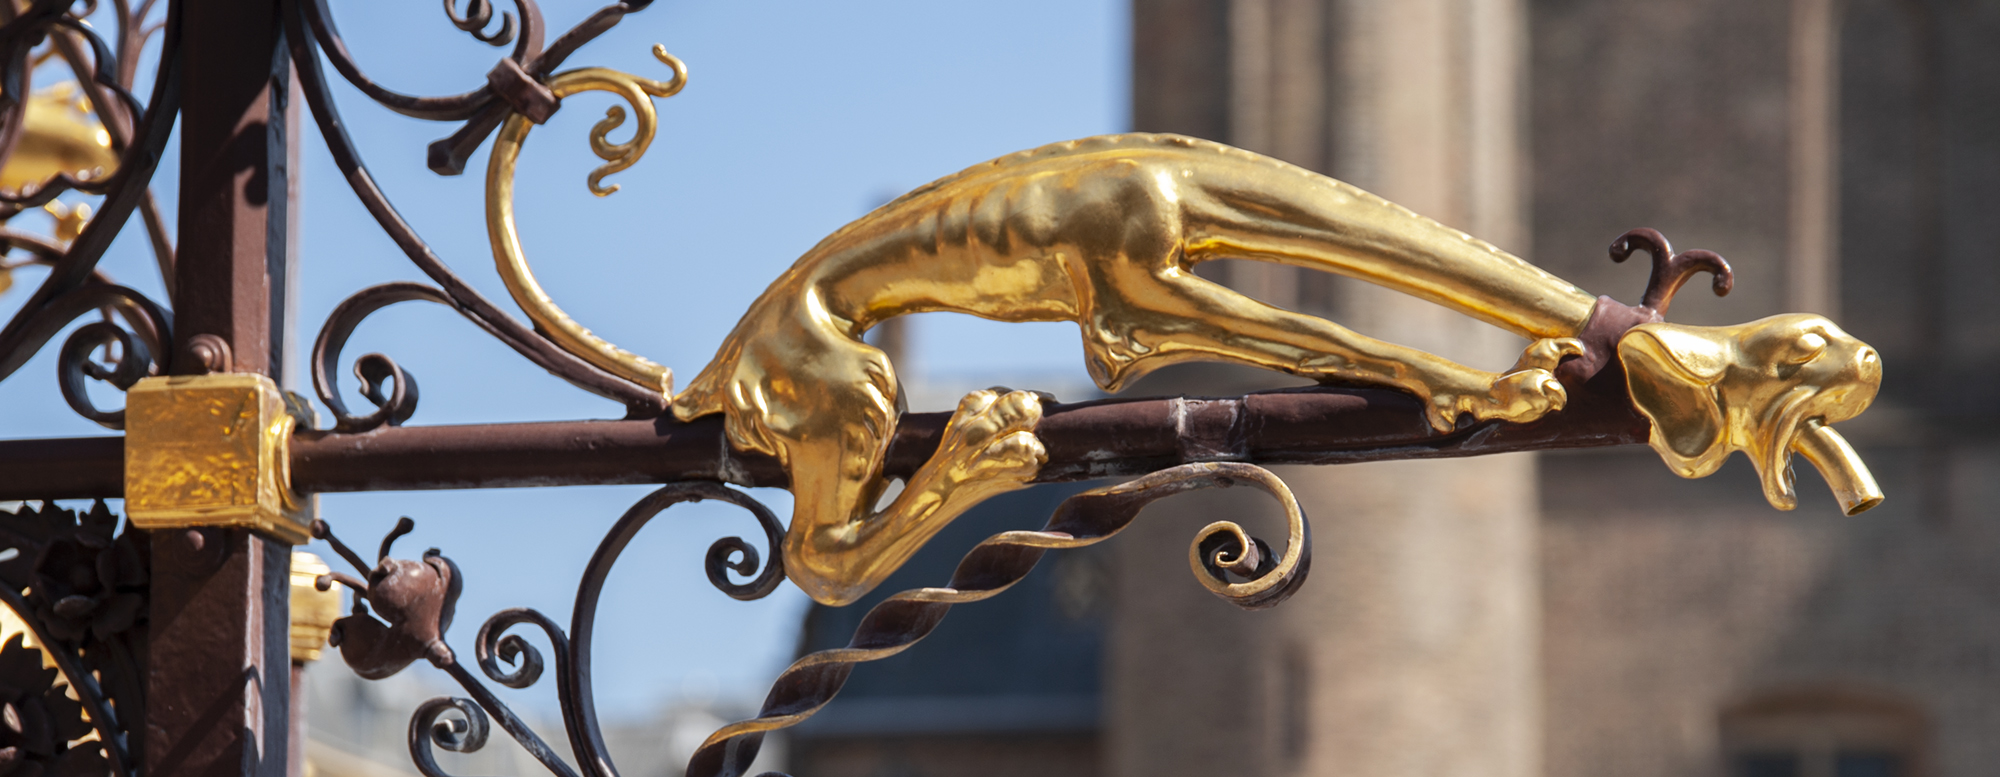 Binnenhof Den Haag | Monumentenfotograaf